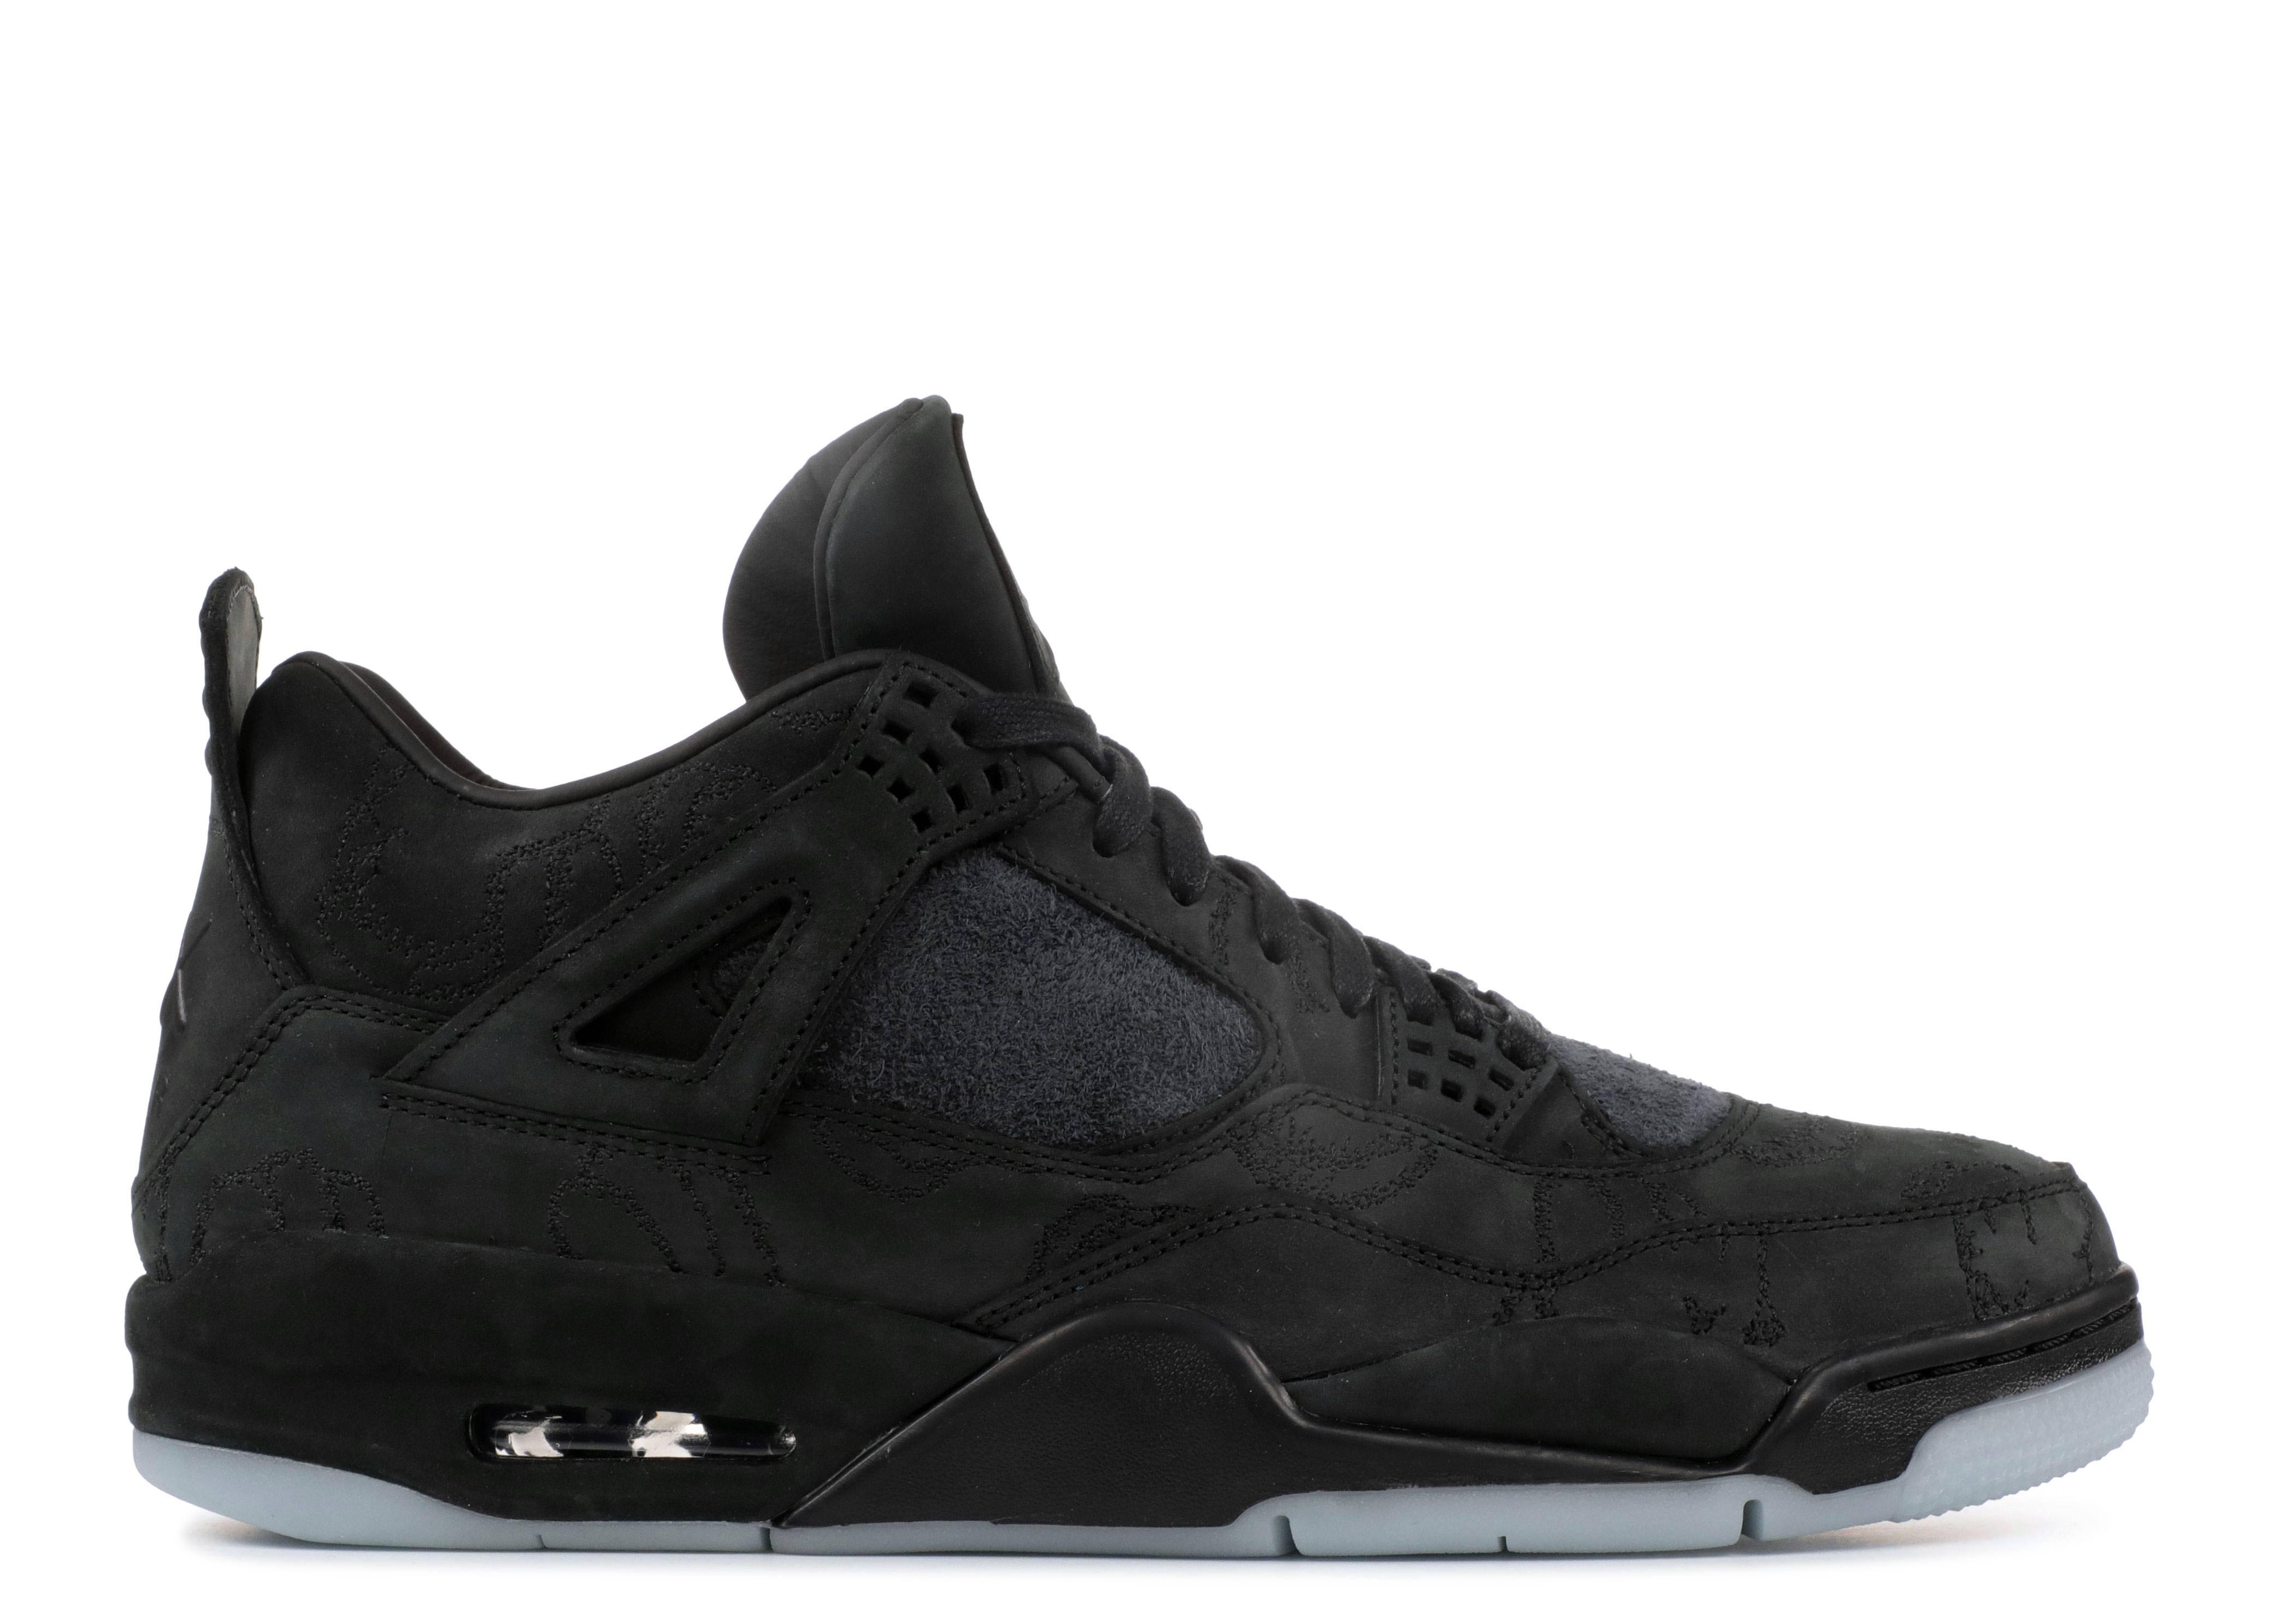 Nike Air Jordan 4 Retro 'KAWS' - 930155-003 - Size 11.5 - HQy3O9